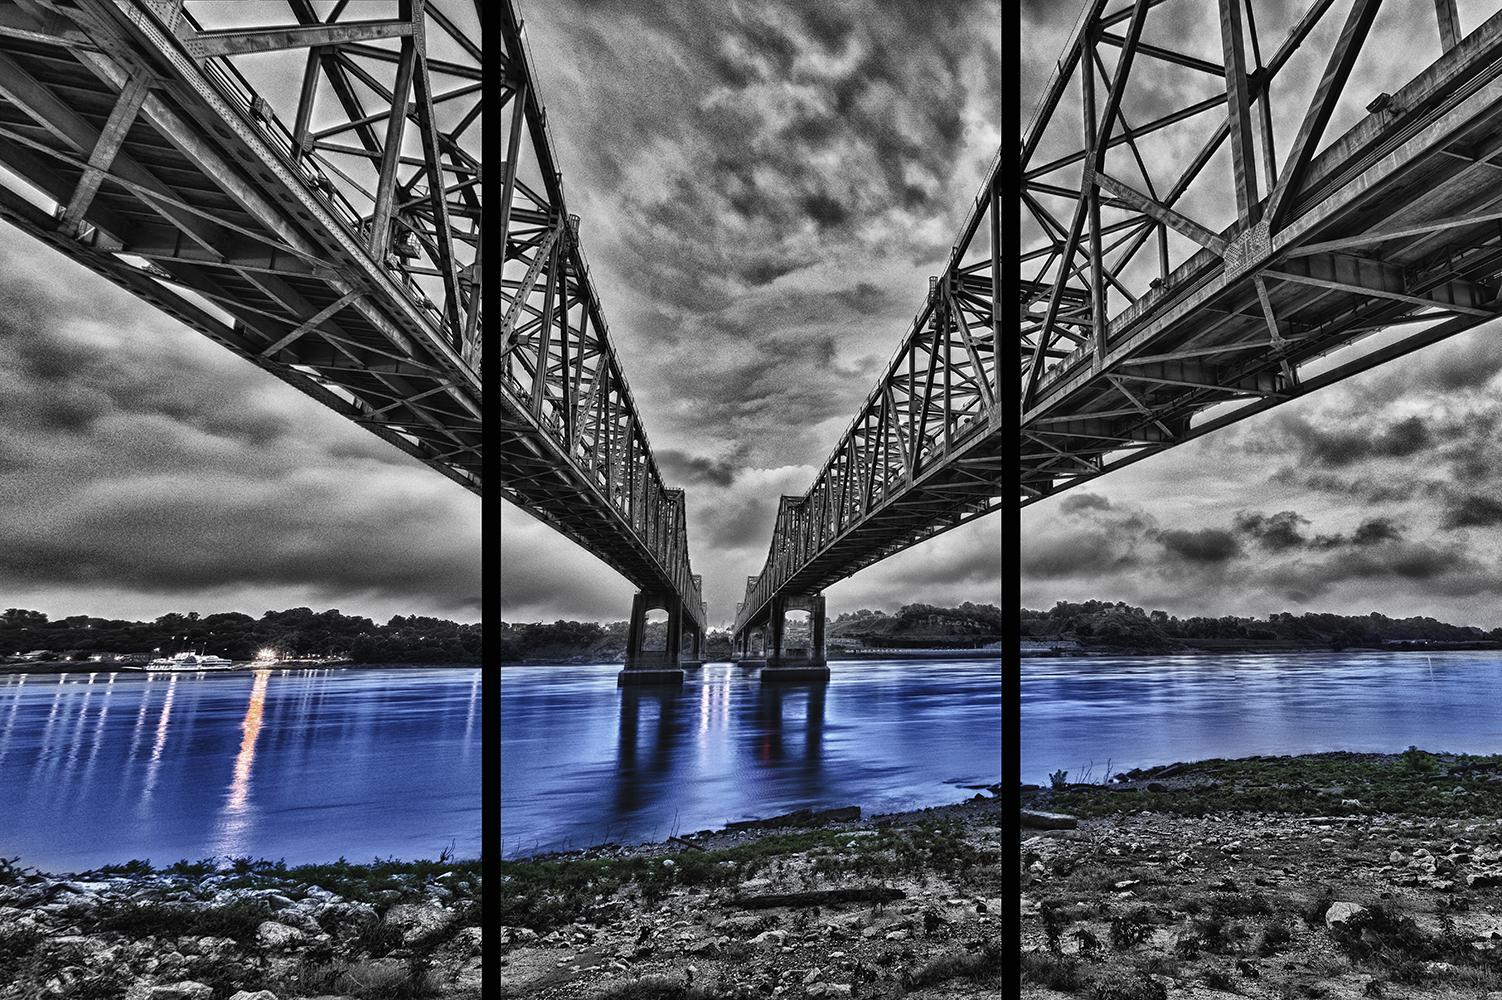 Bridge_trip_tych_va6omw